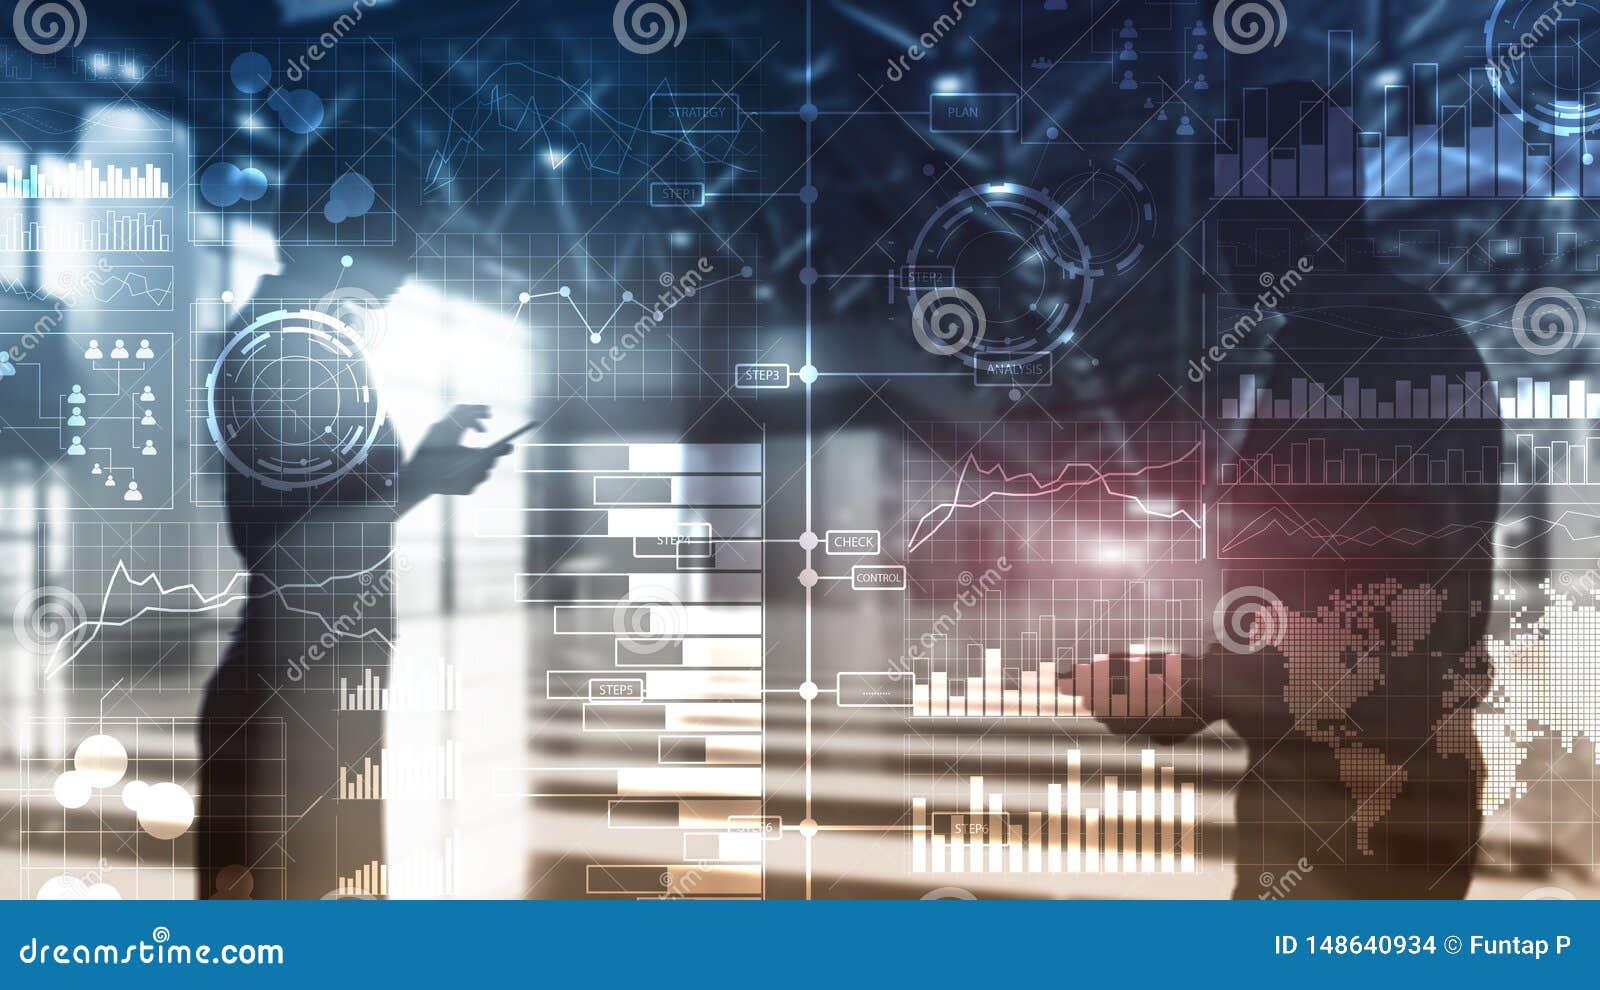 Bedrijfsintelligentie Diagram, Grafiek die, Voorraad, transparant Investeringsdashboard, handel drijven